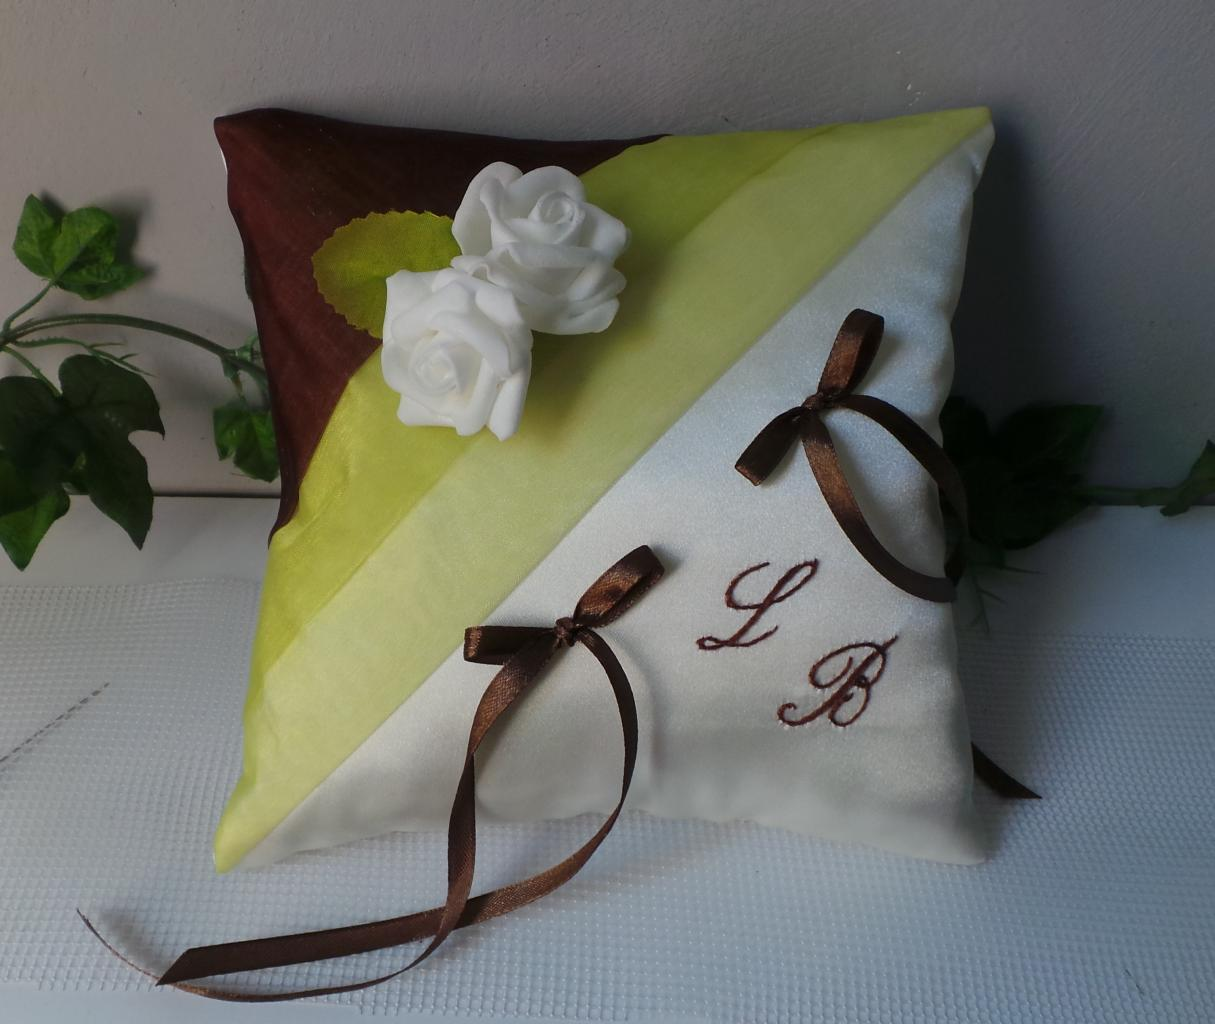 coussin alliances vert anis marron chocolat (7)